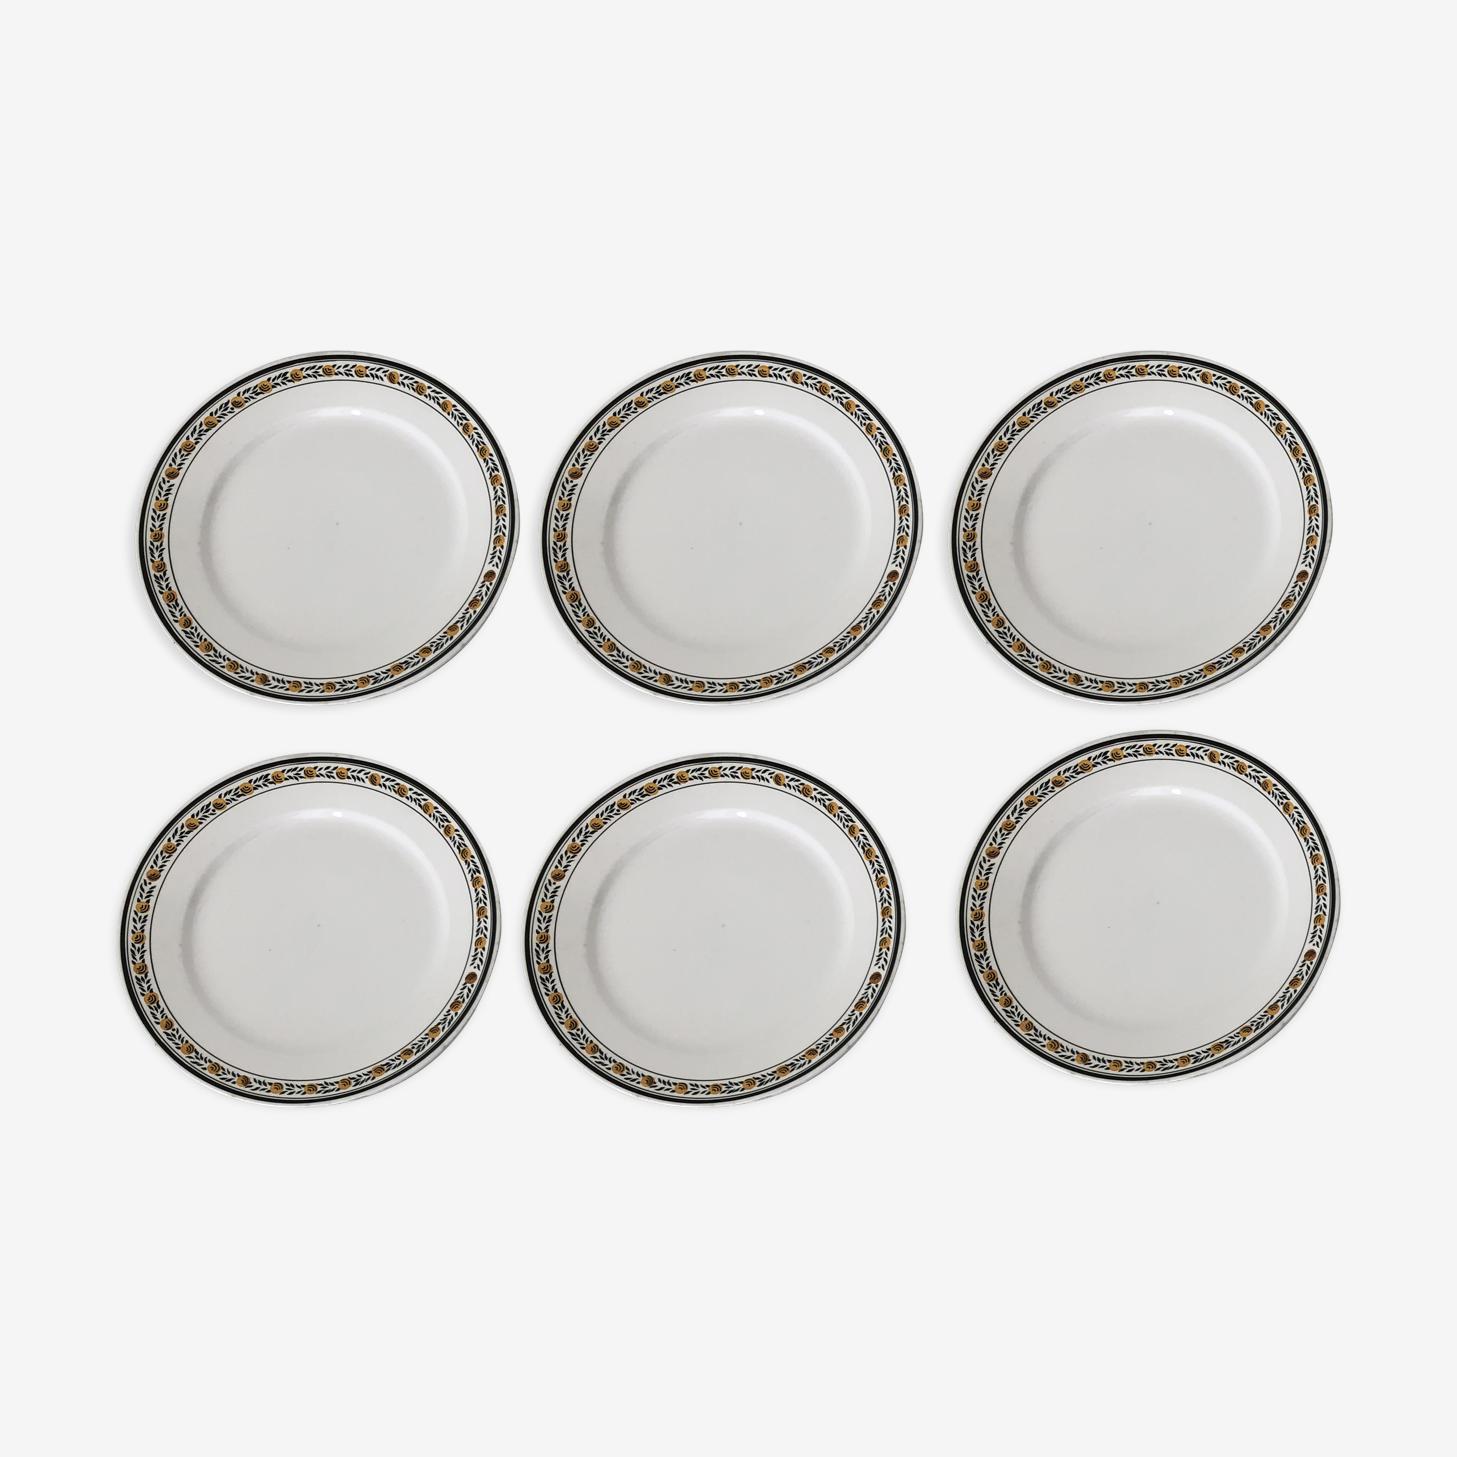 6 dinner plates Sarreguemines era Art Deco